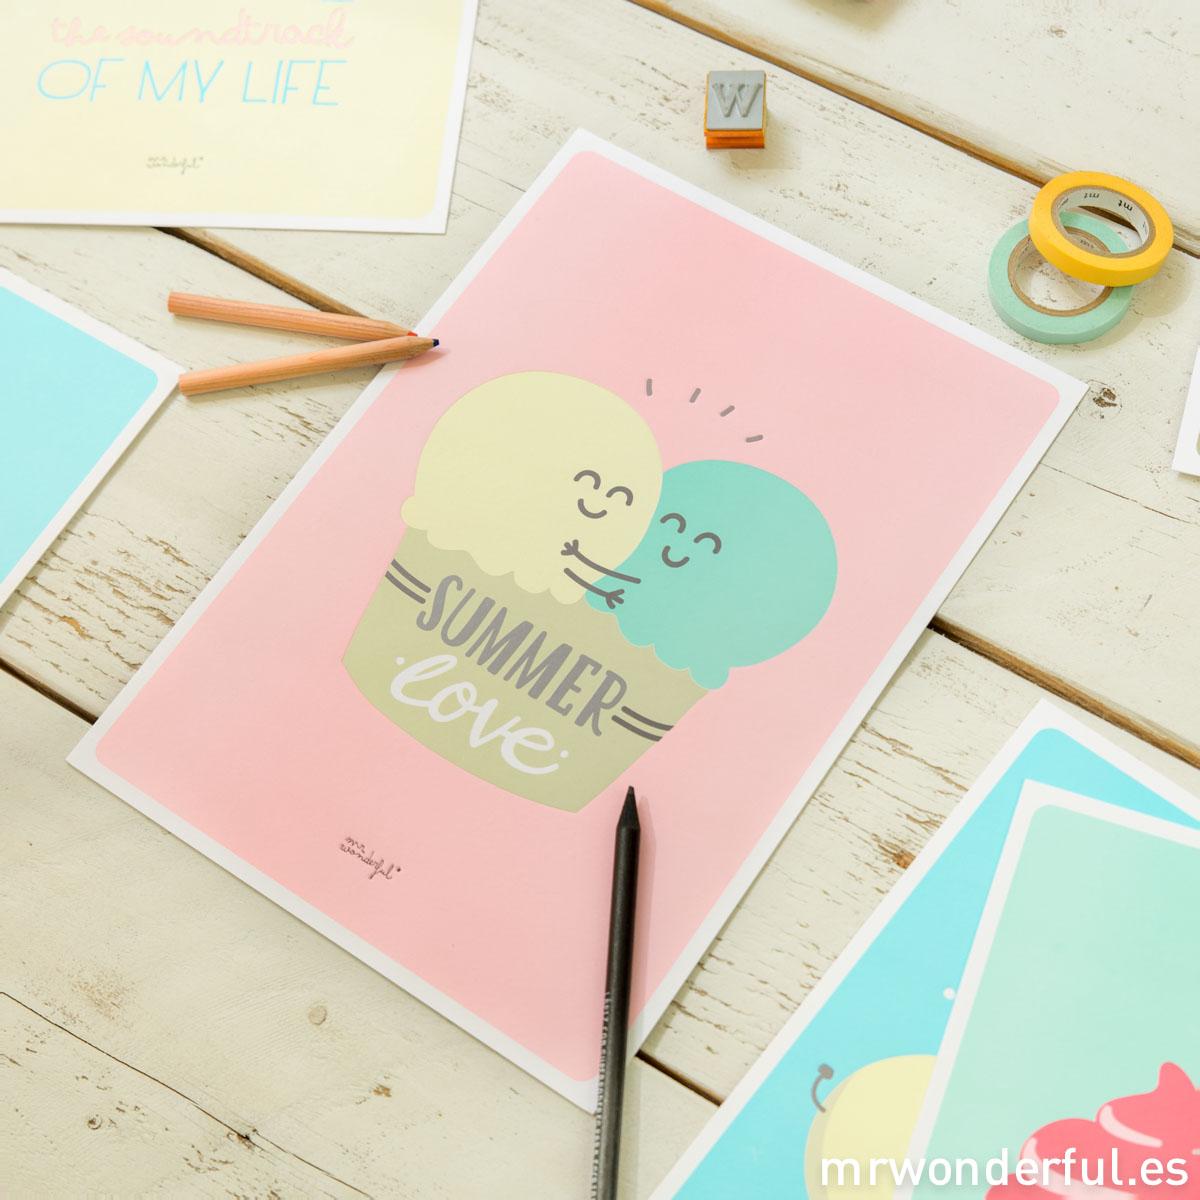 mrwonderful_LAM-SUMMER-09_lamina-summer-love-16